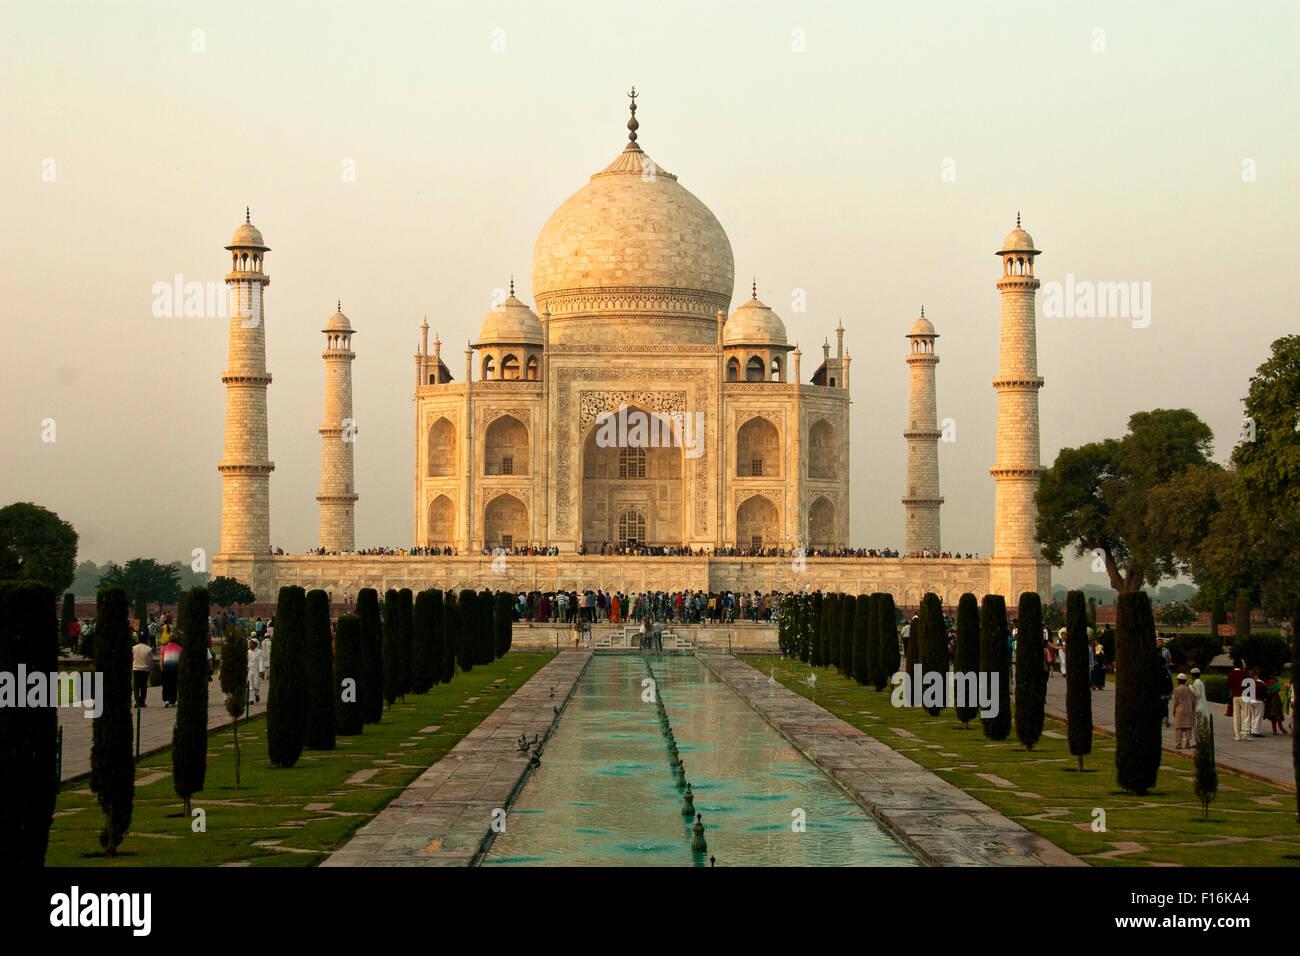 Taj Mahal, Agra, India Imagen De Stock